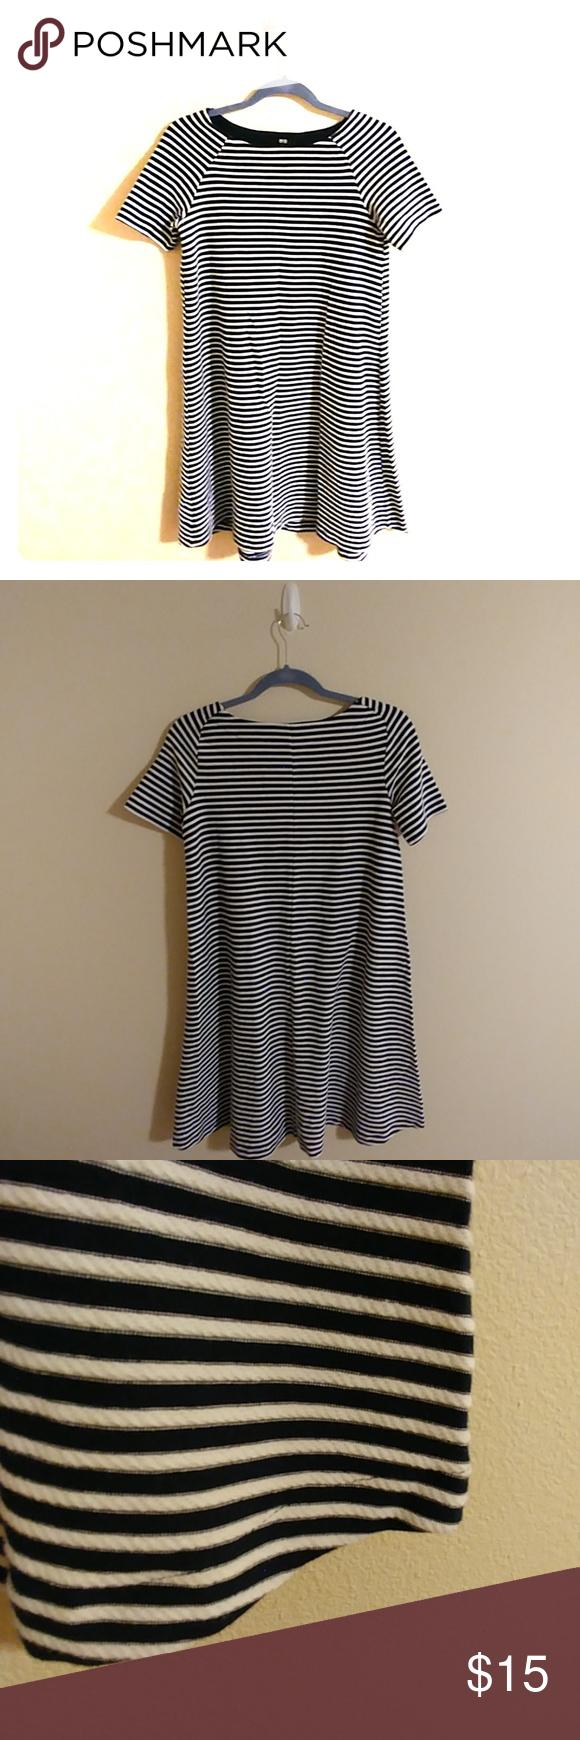 Uniqlo dress black u white stripes small euc thicker high quality